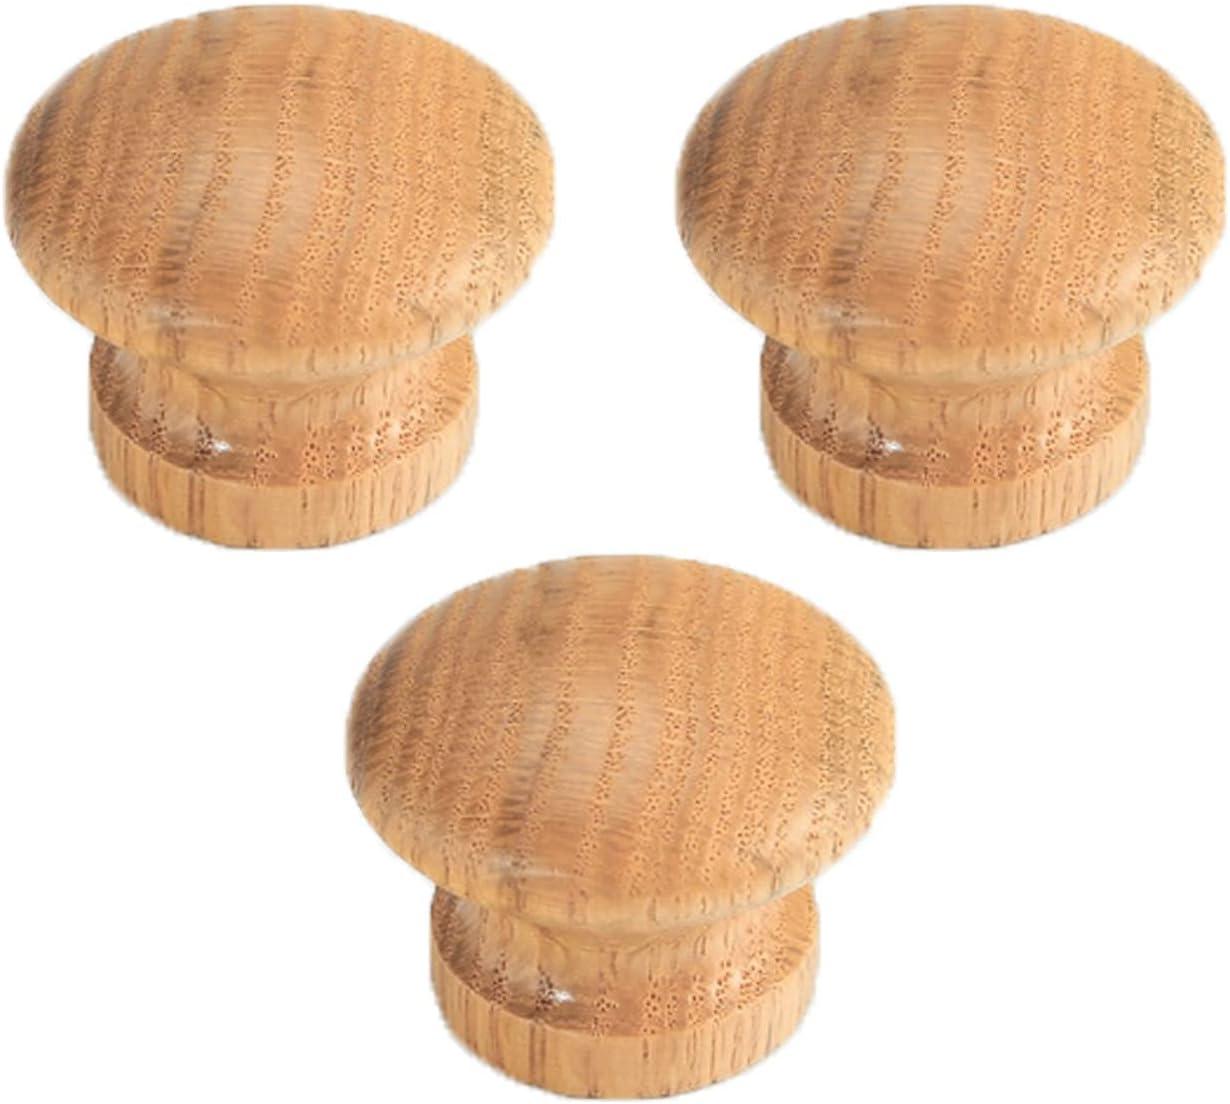 3 pomos de Madera para Muebles, Tiradores Naturales, Tiradores Tradicionales para cajones, Tiradores de Puerta de Estilo Simple, palancas de Puerta para Armario, Tiradores de tocador con Tornillos (r